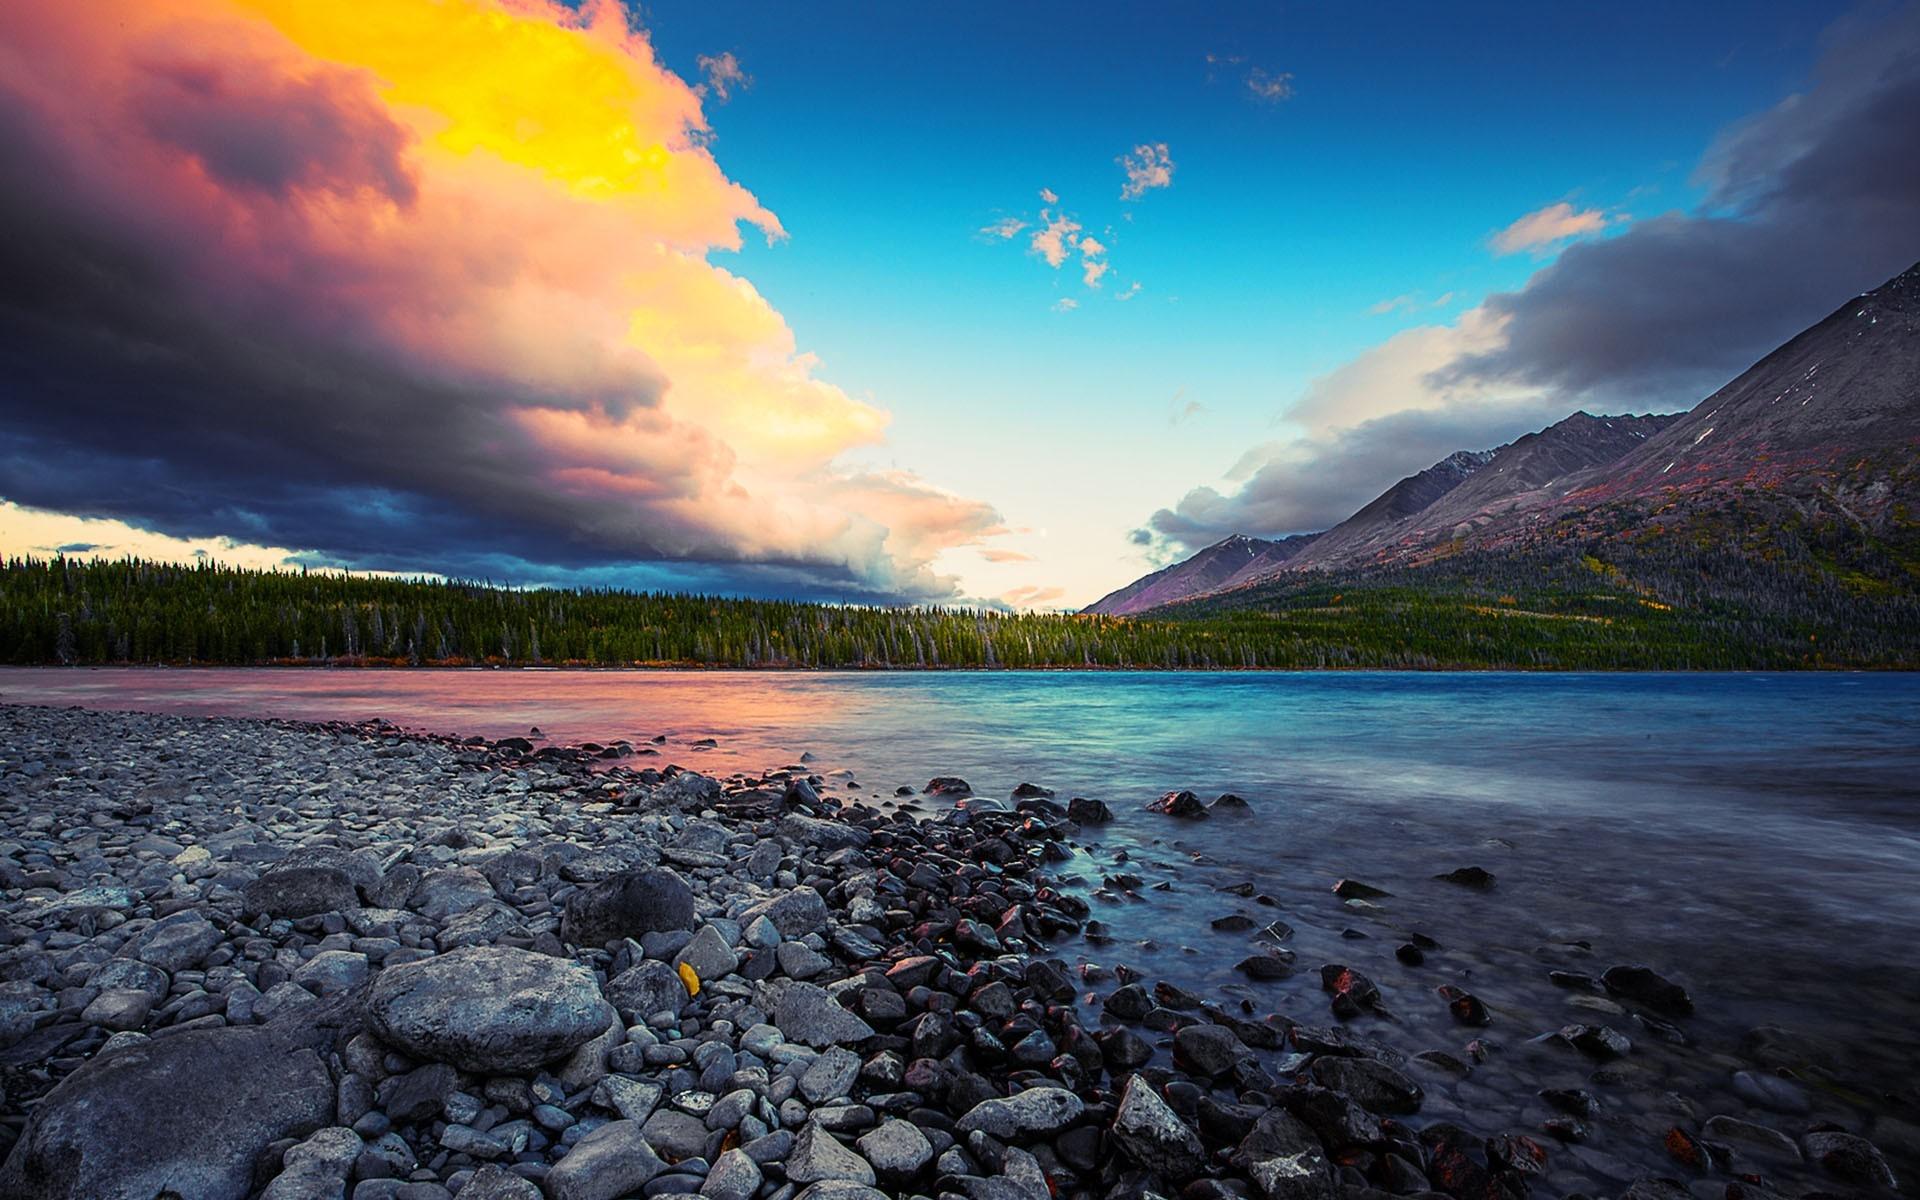 природа река горы облака набо nature river mountains clouds Noboa загрузить